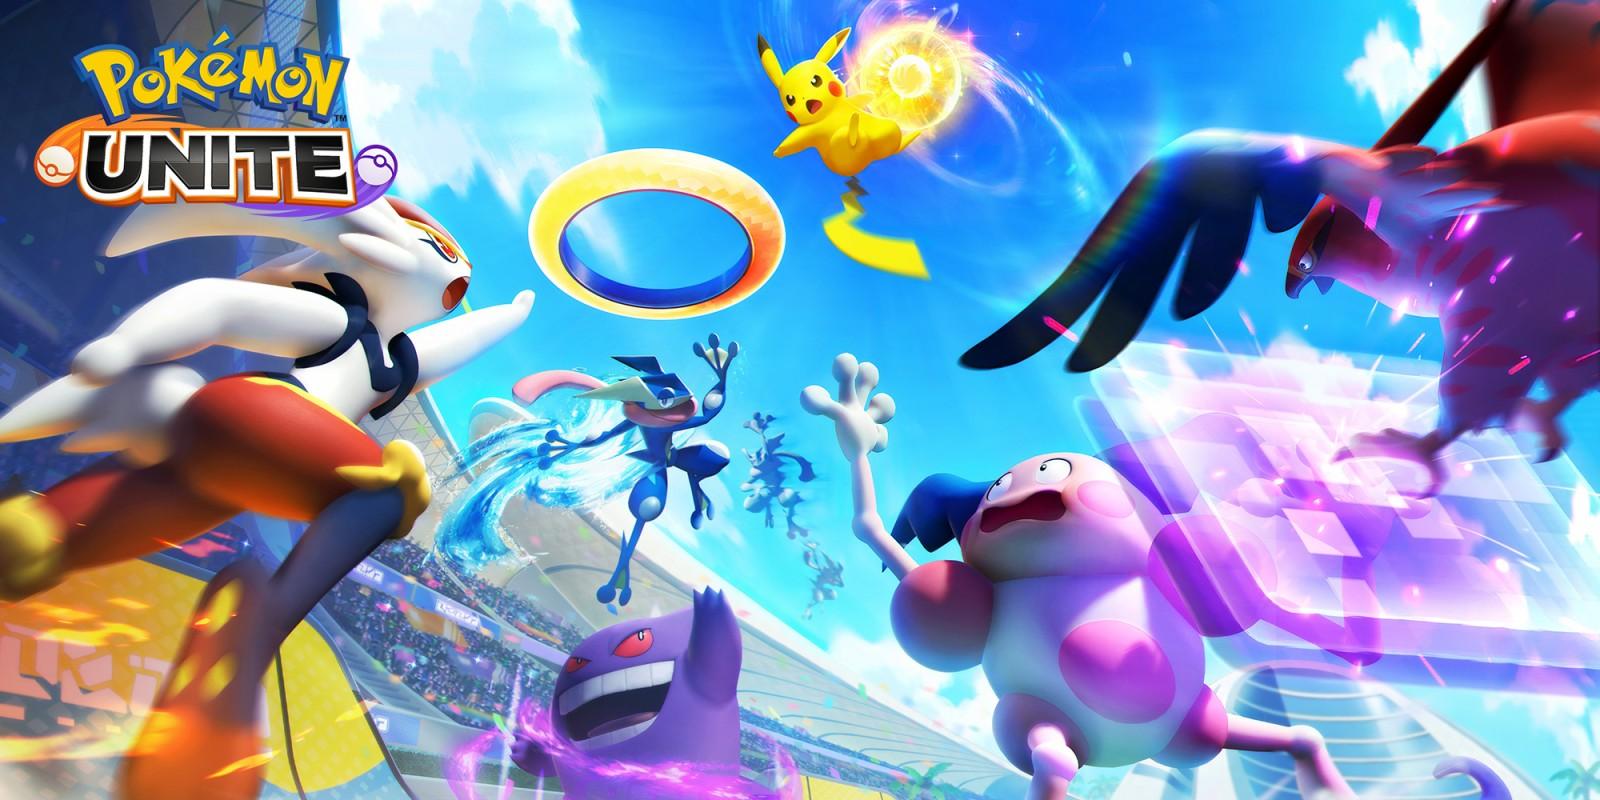 Pokémon UNITE nintendo switch costo pago